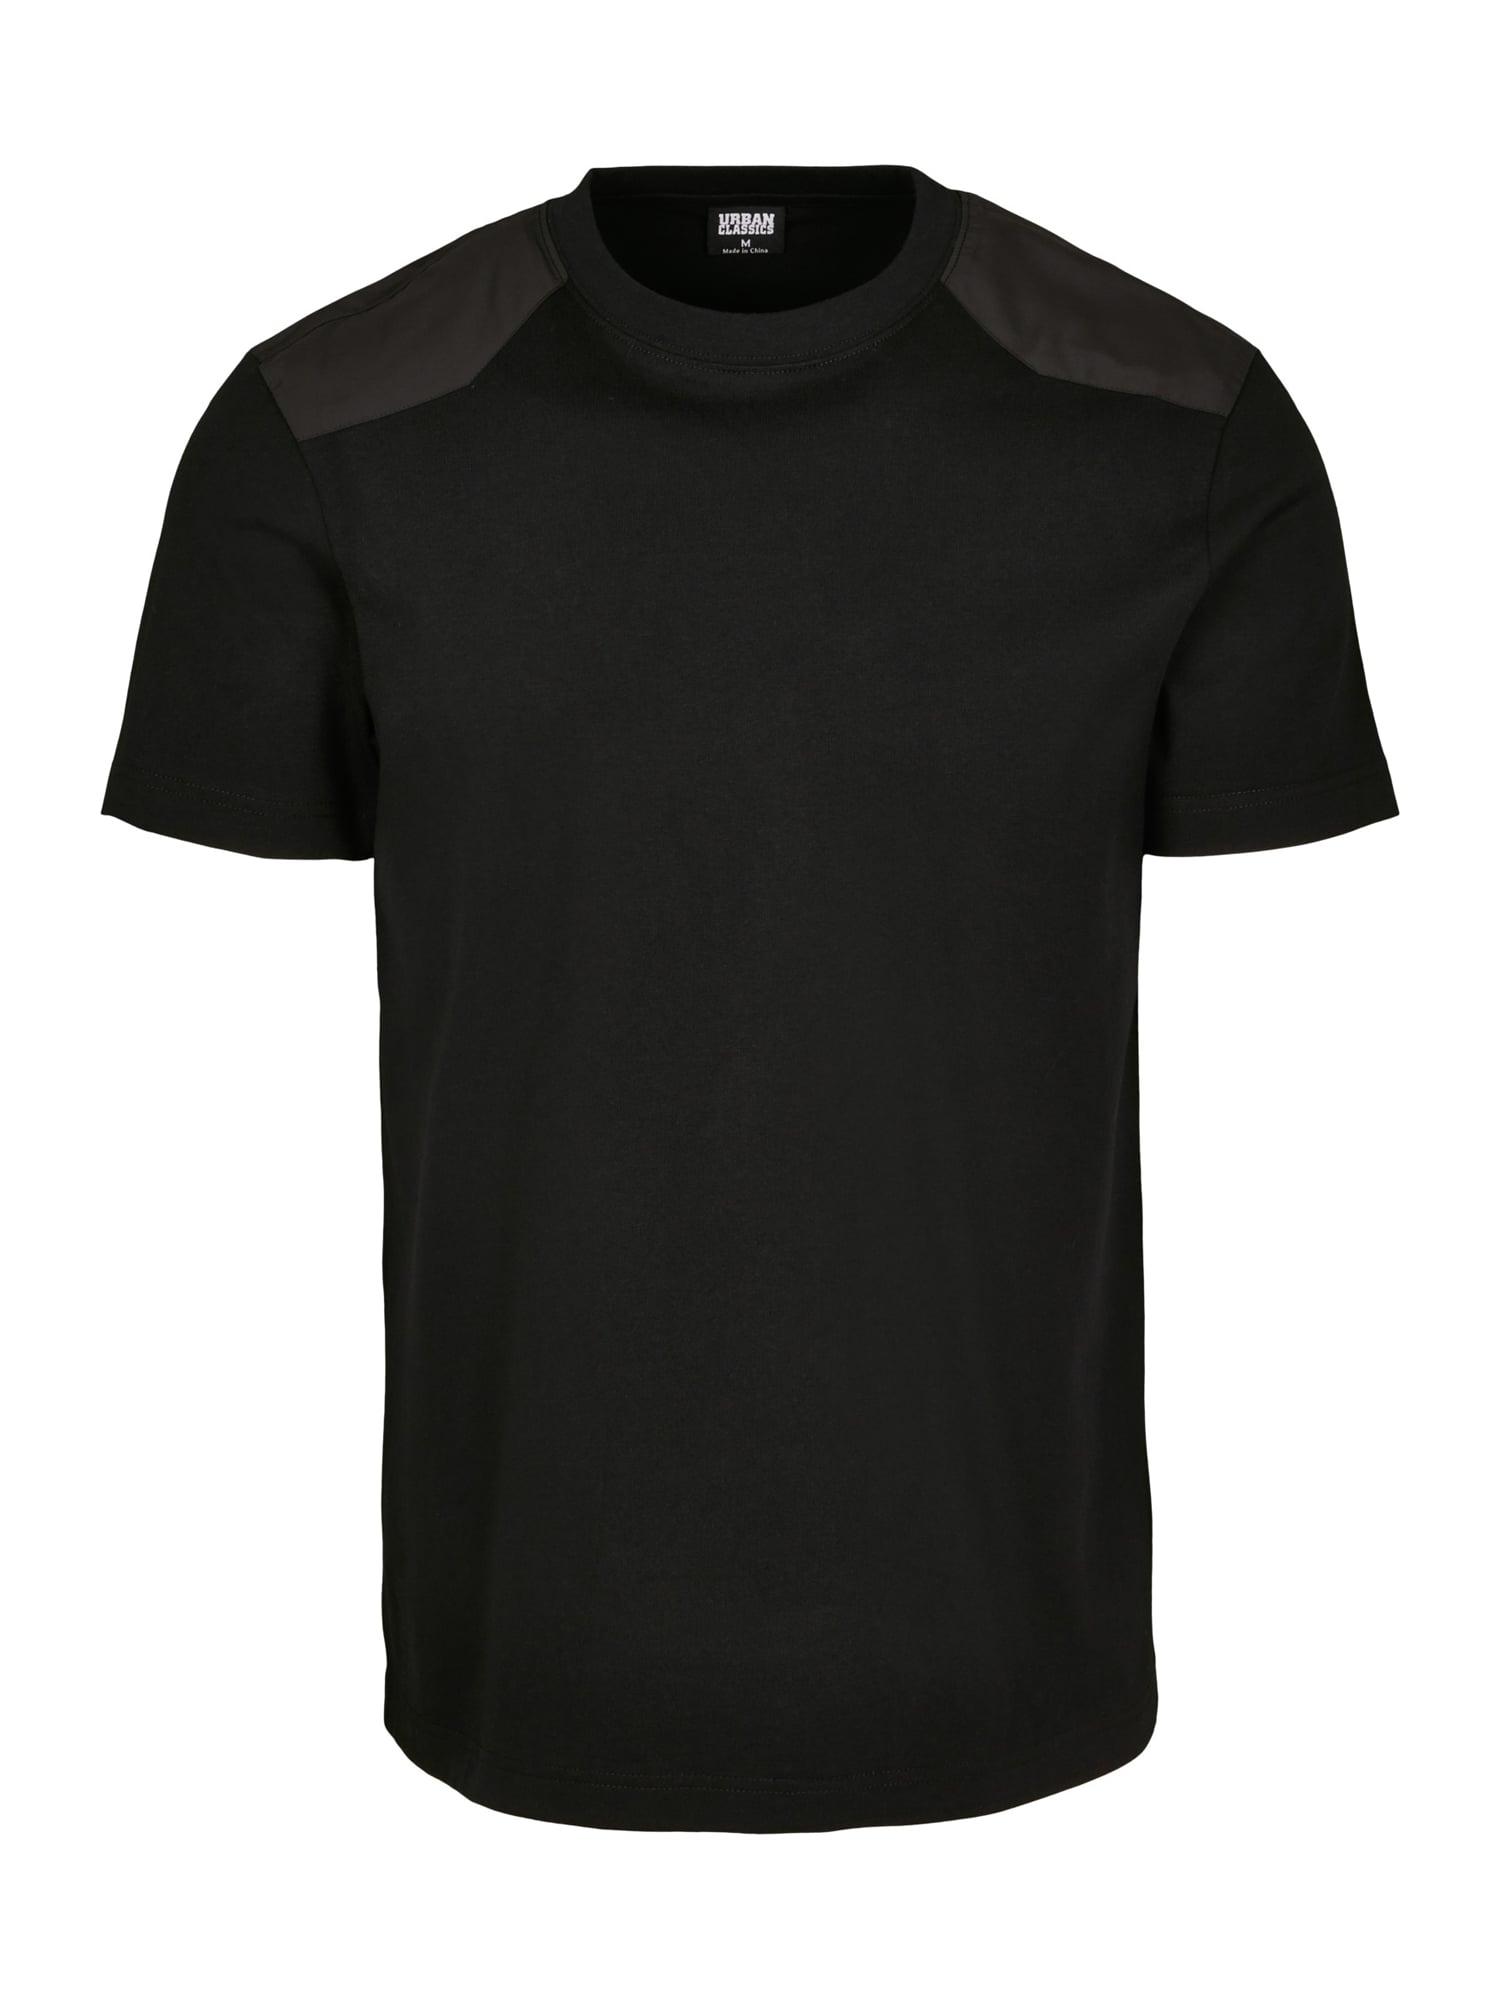 Urban Classics T-Shirt 'Military'  - Noir - Taille: S - male